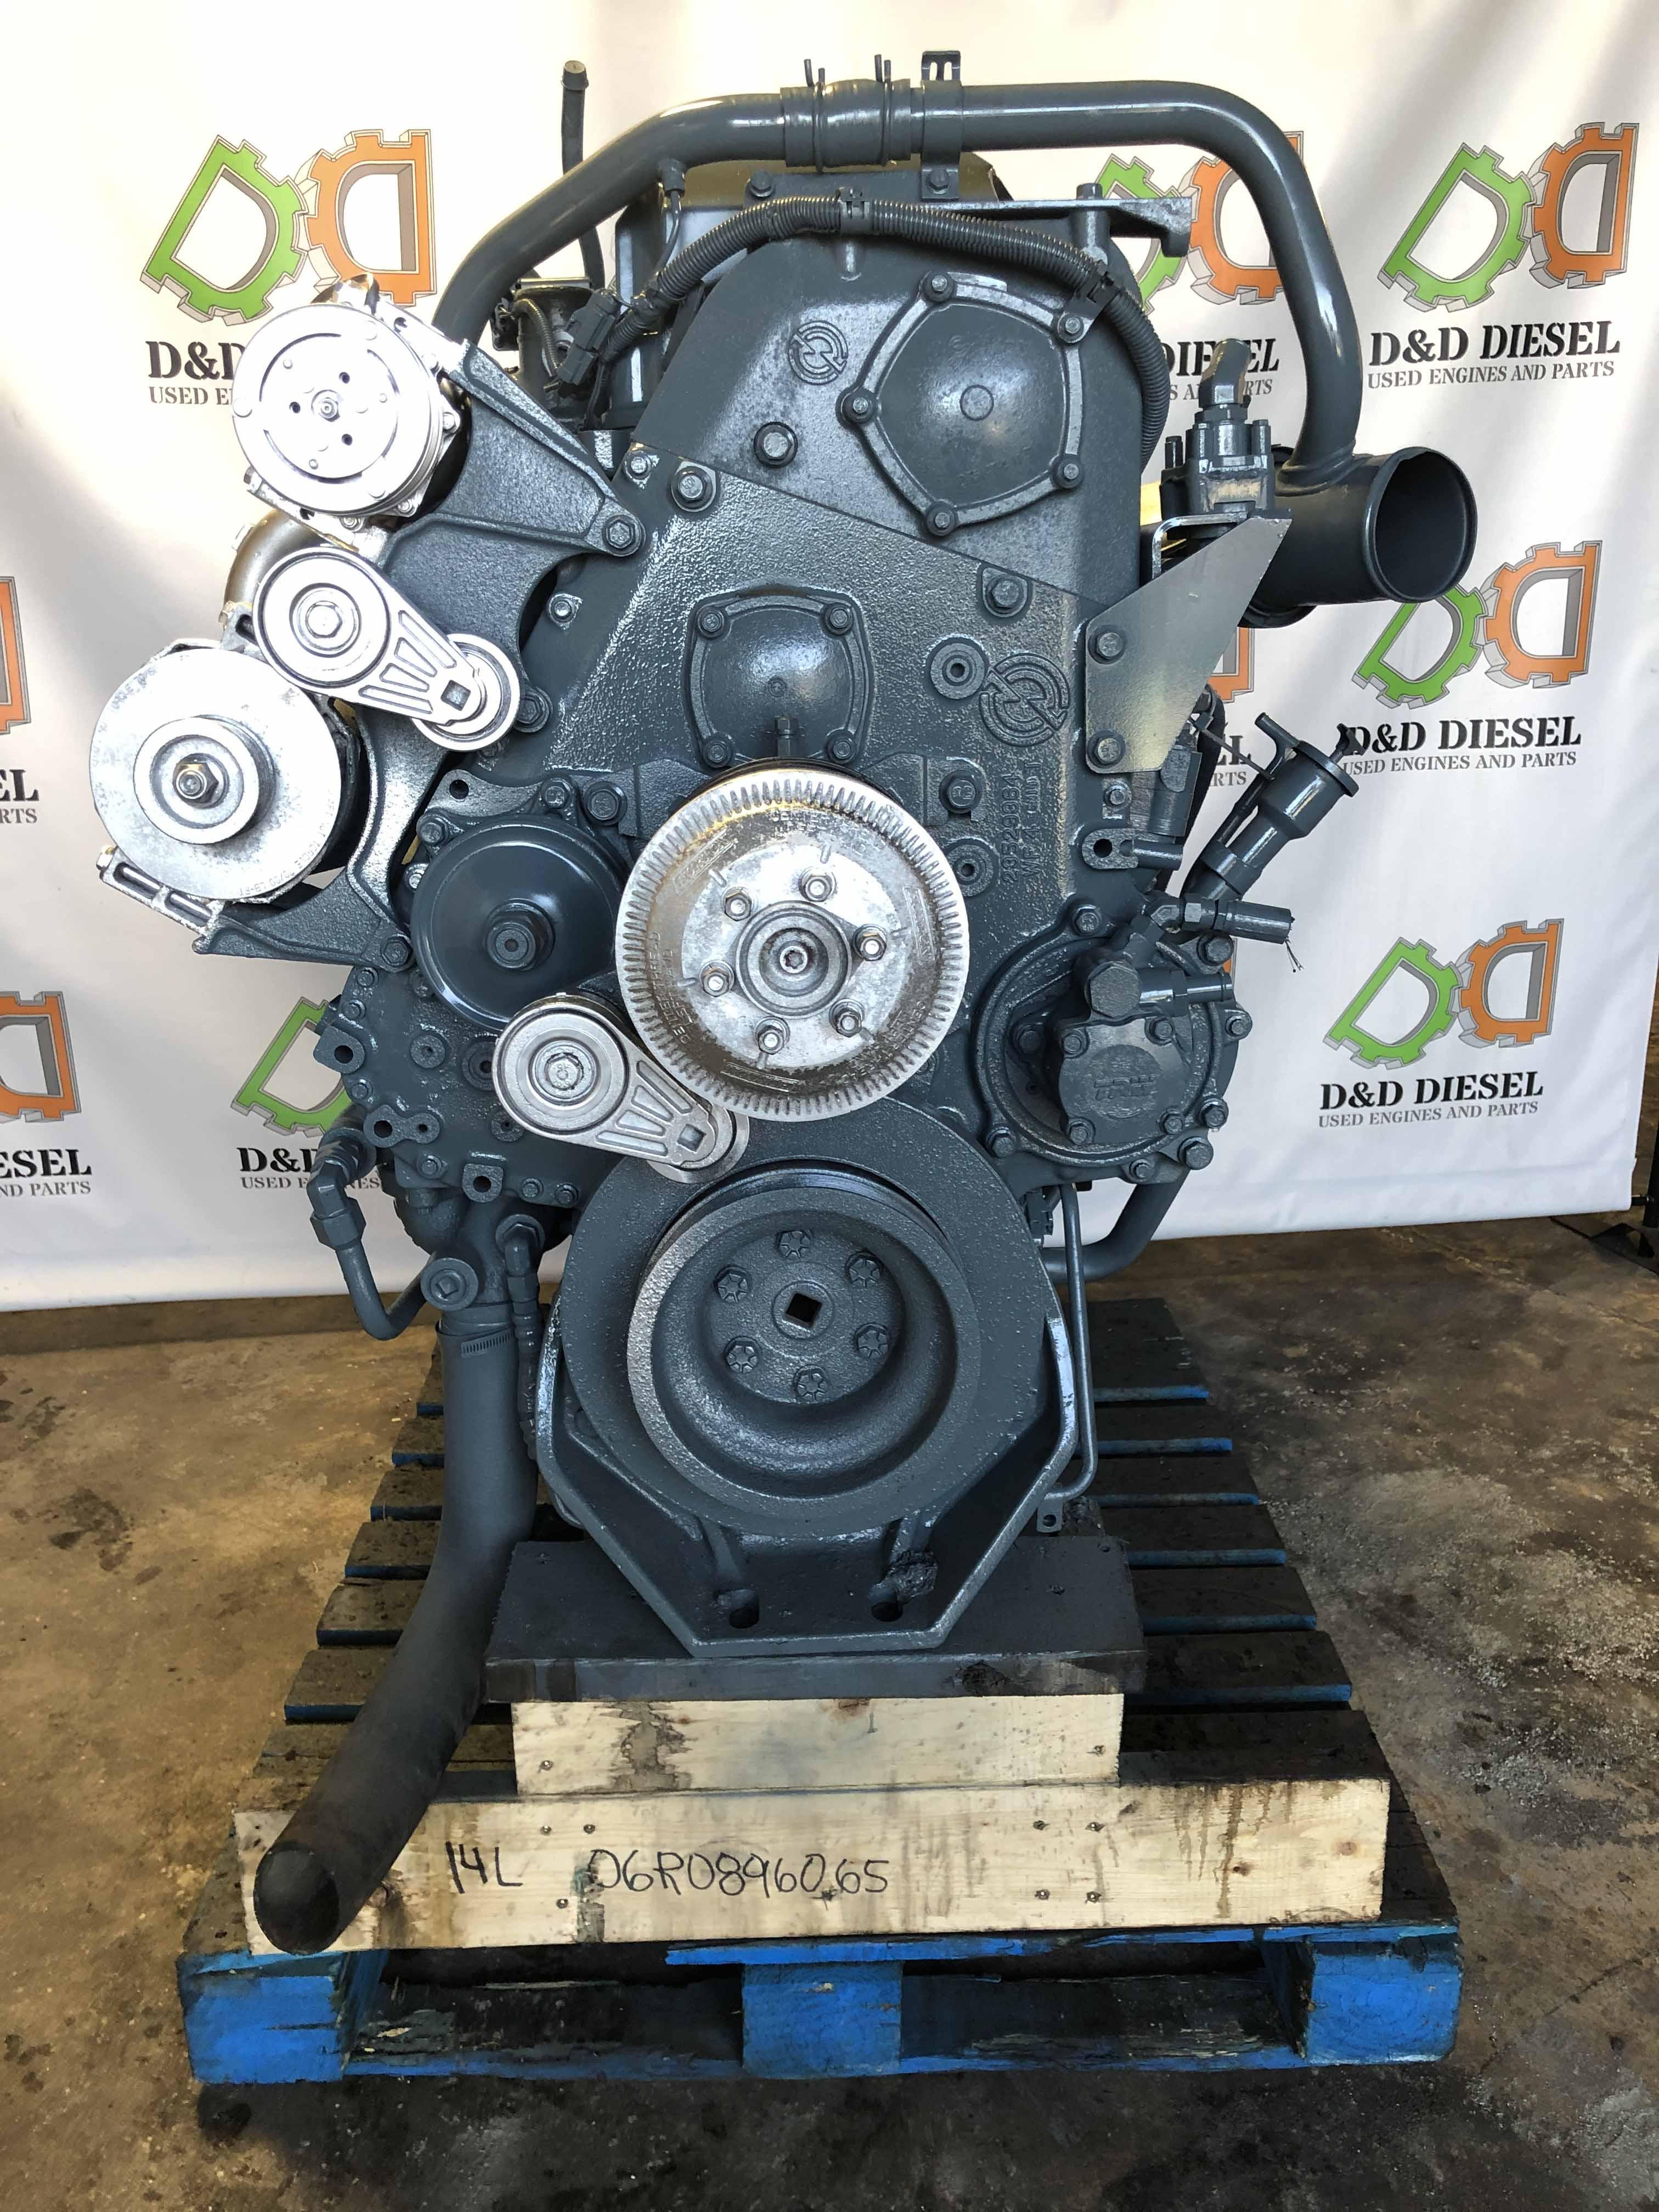 Detroit Diesel Series 60 14L Engine For Sale #06R0896065